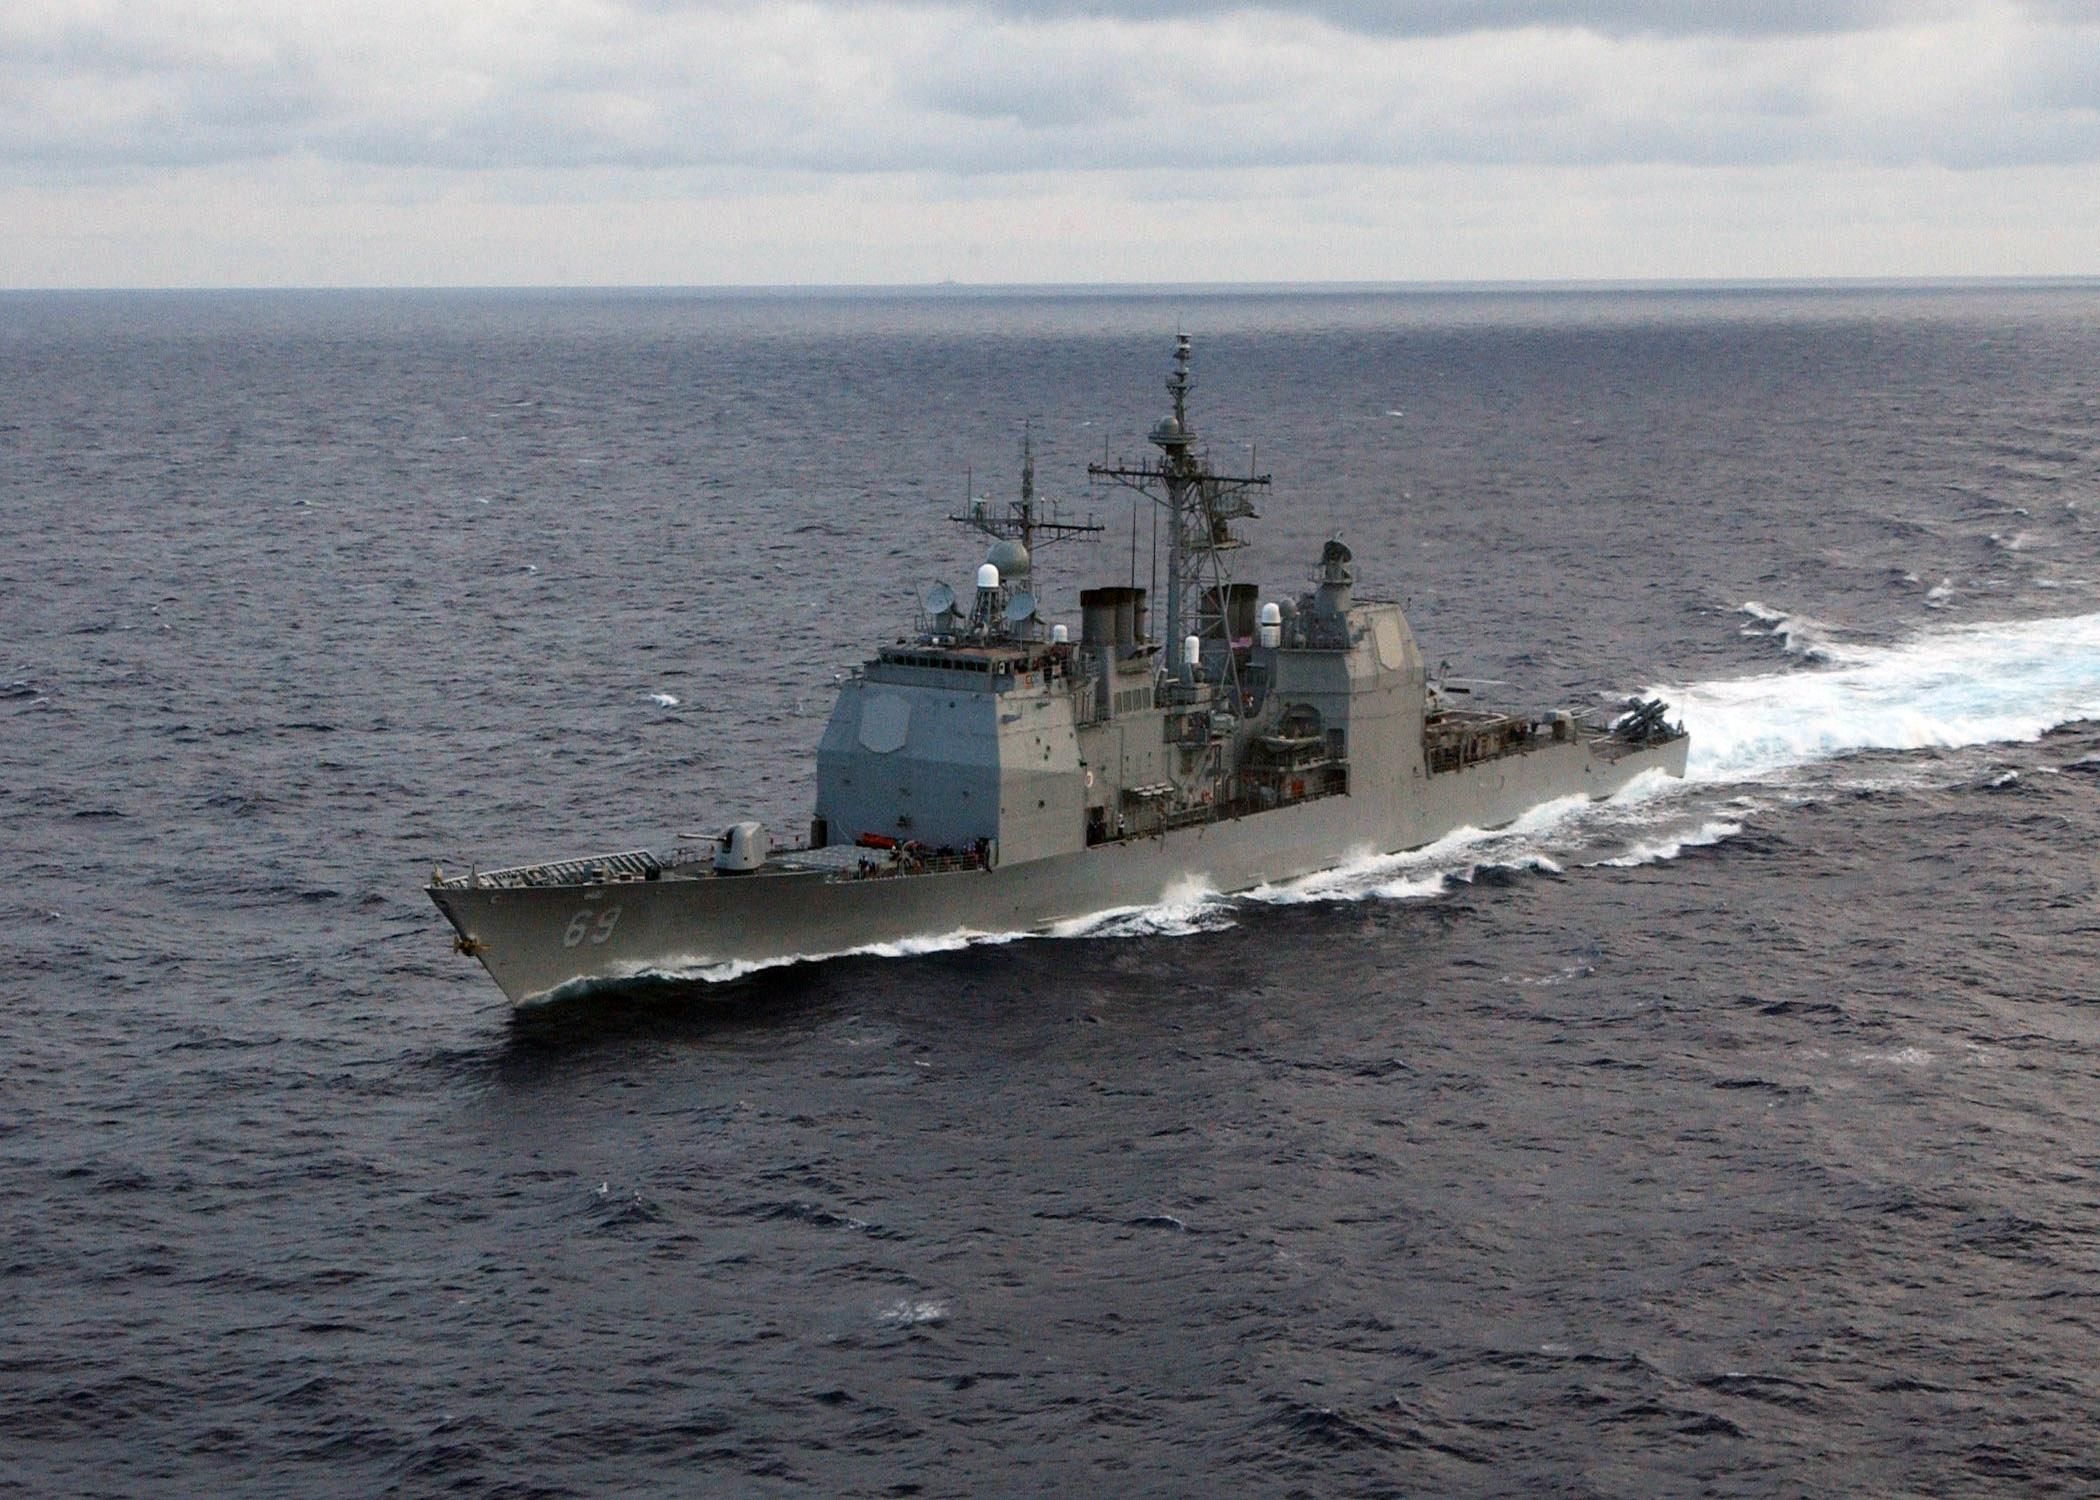 USS Vicksburg in the Atlantic Ocean